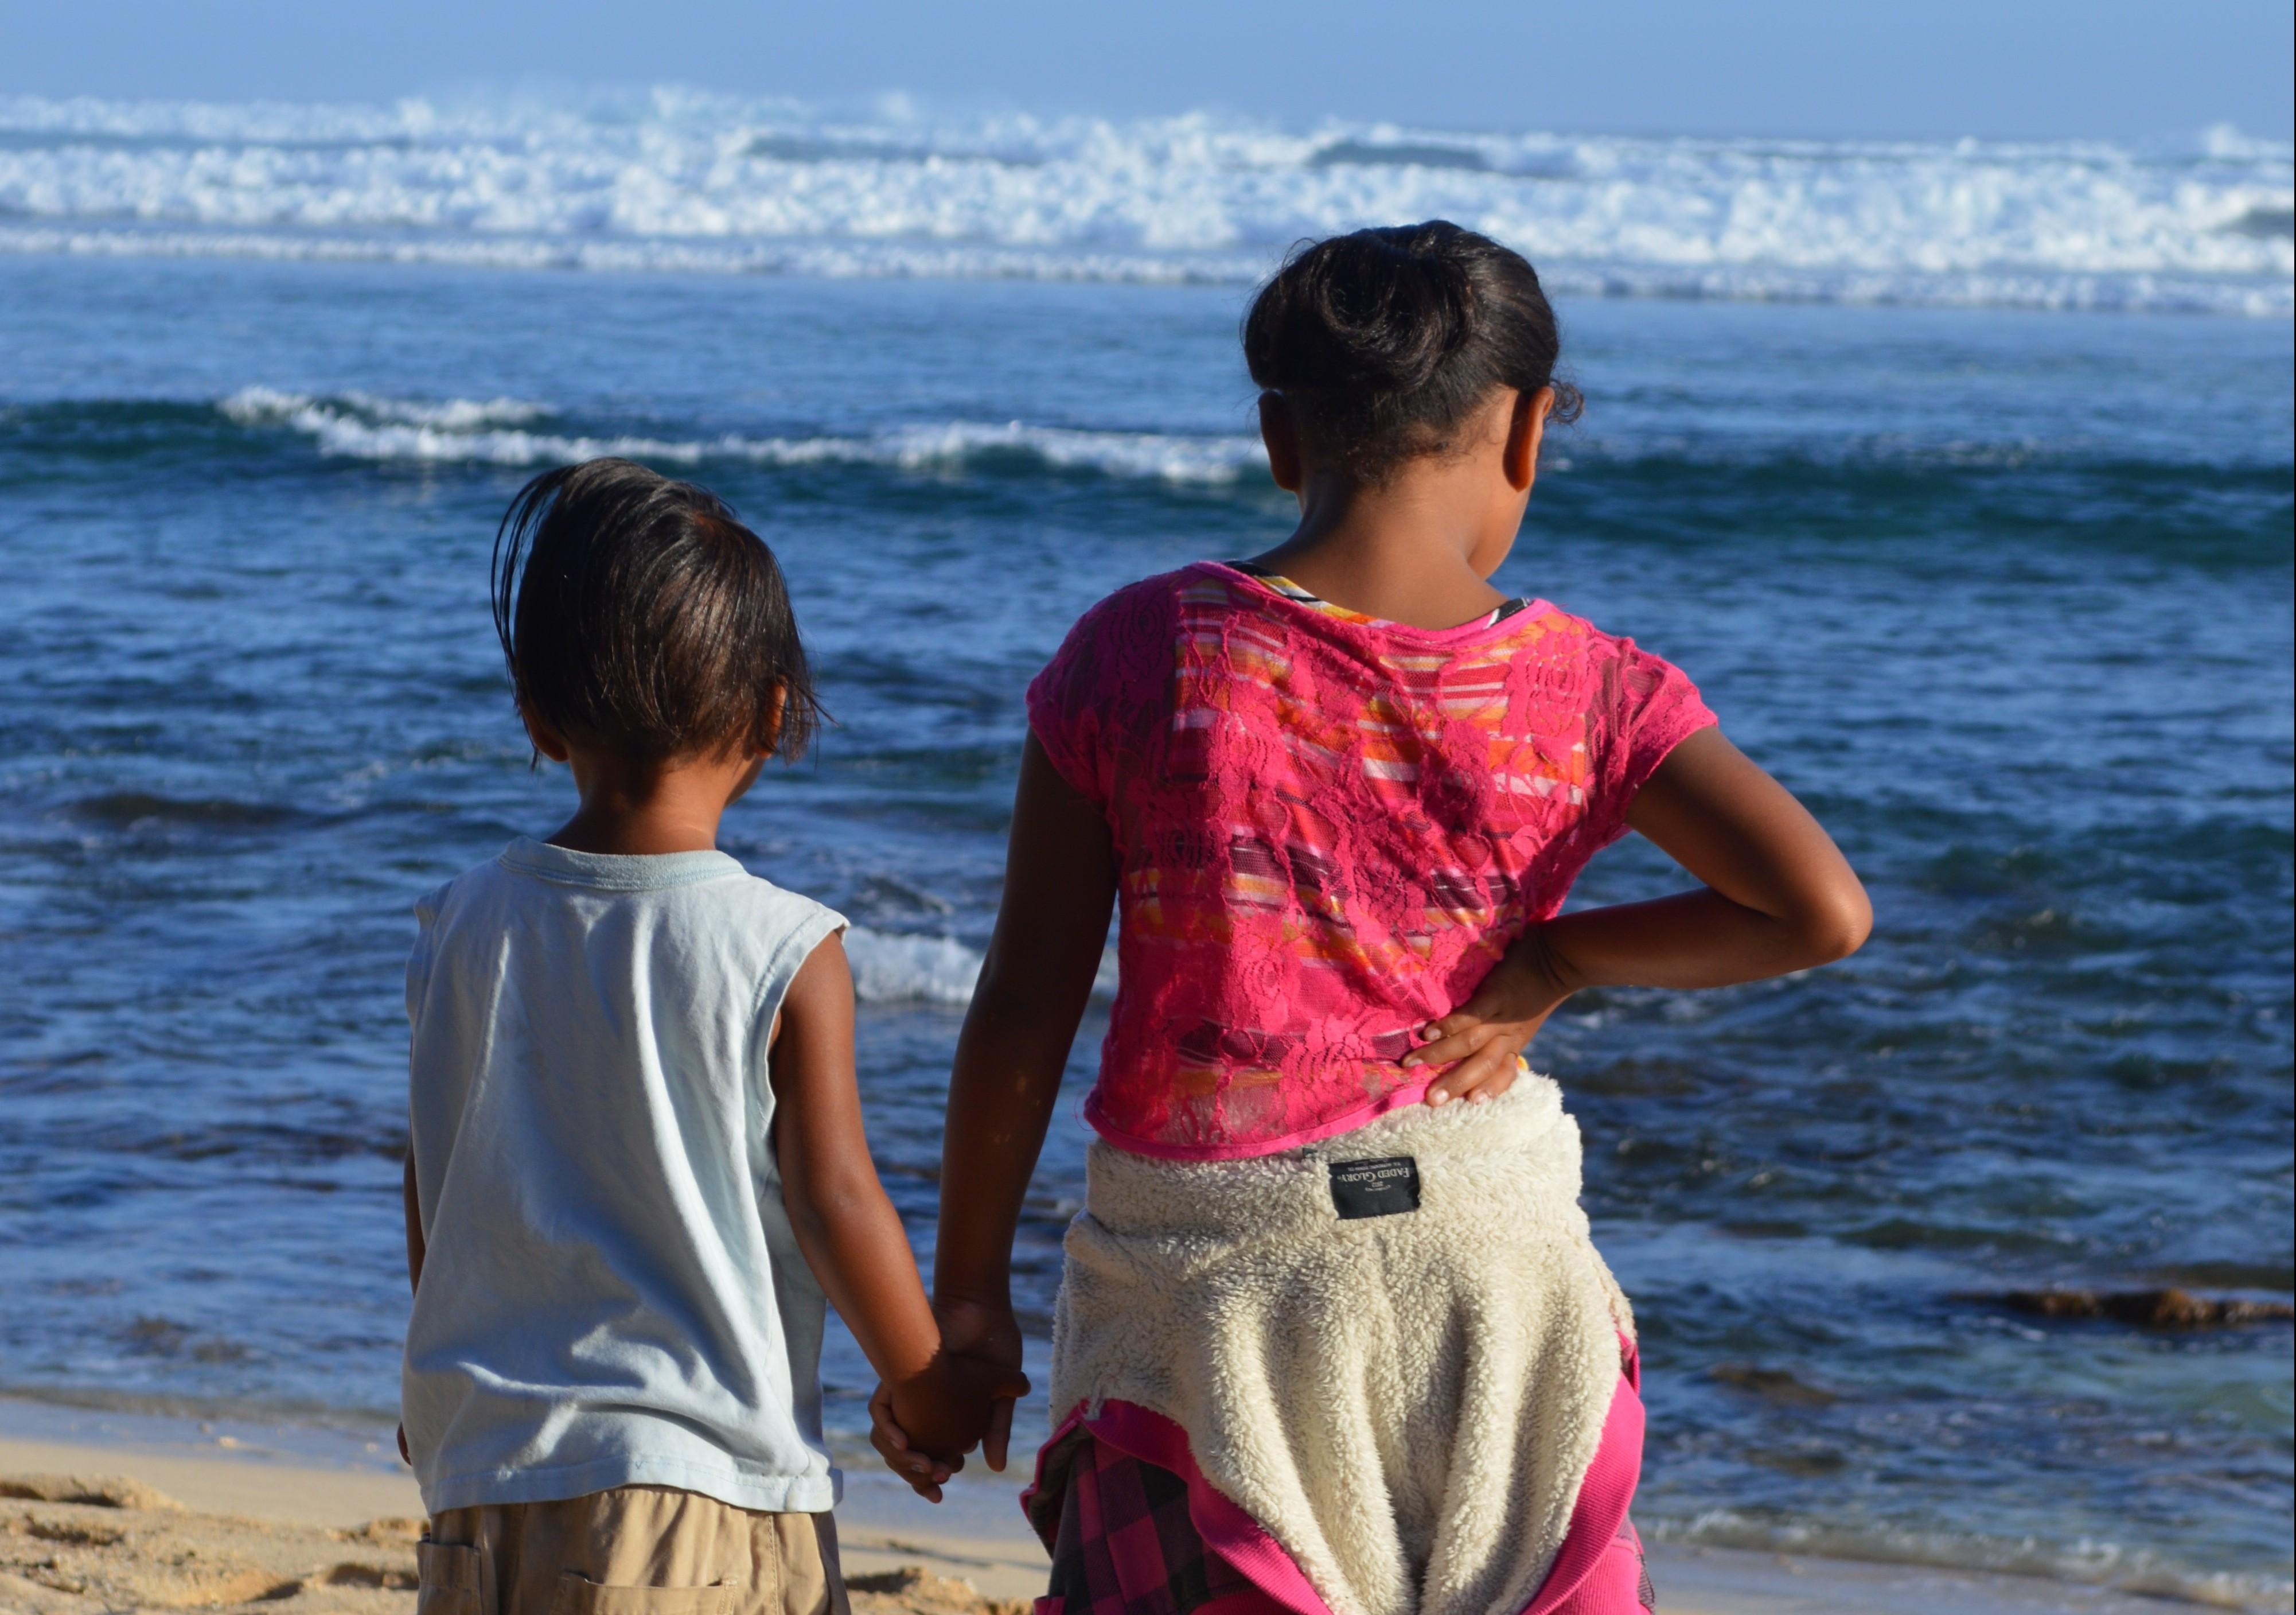 Earth Day in Hawaii: 6 Ways to Honor God's 'Aina